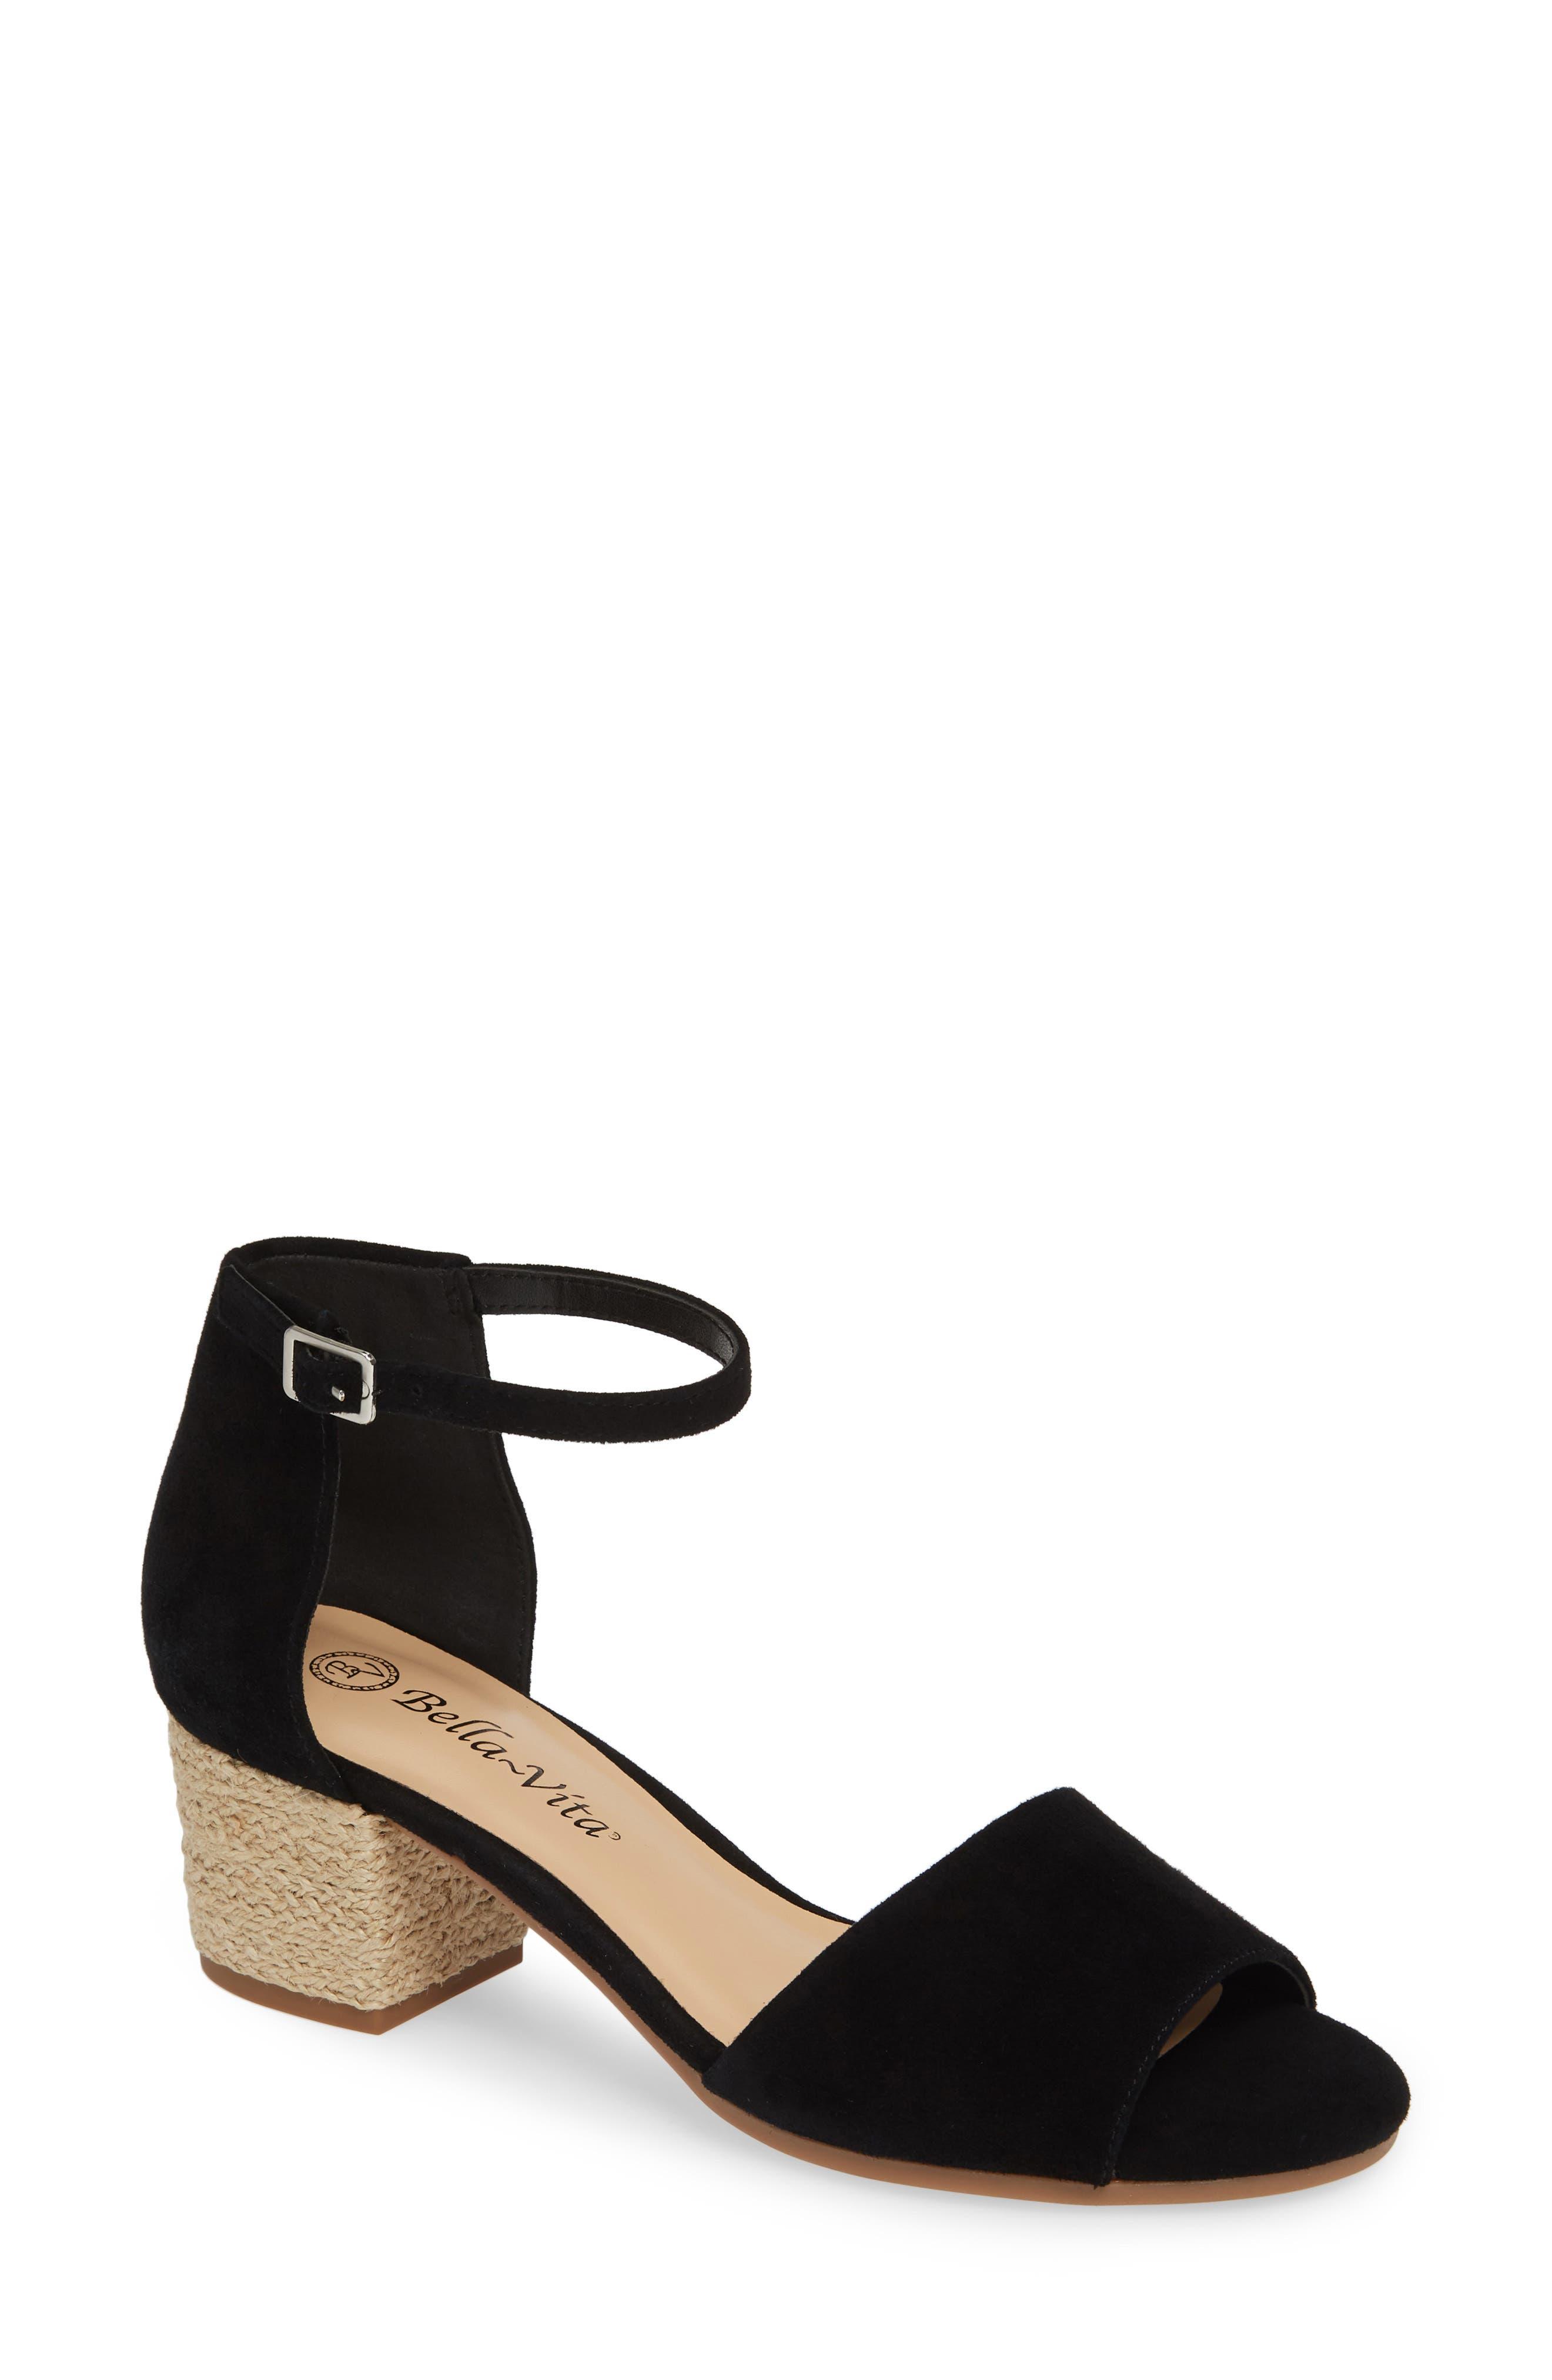 BELLA VITA, Fable Sandal, Main thumbnail 1, color, BLACK SUEDE